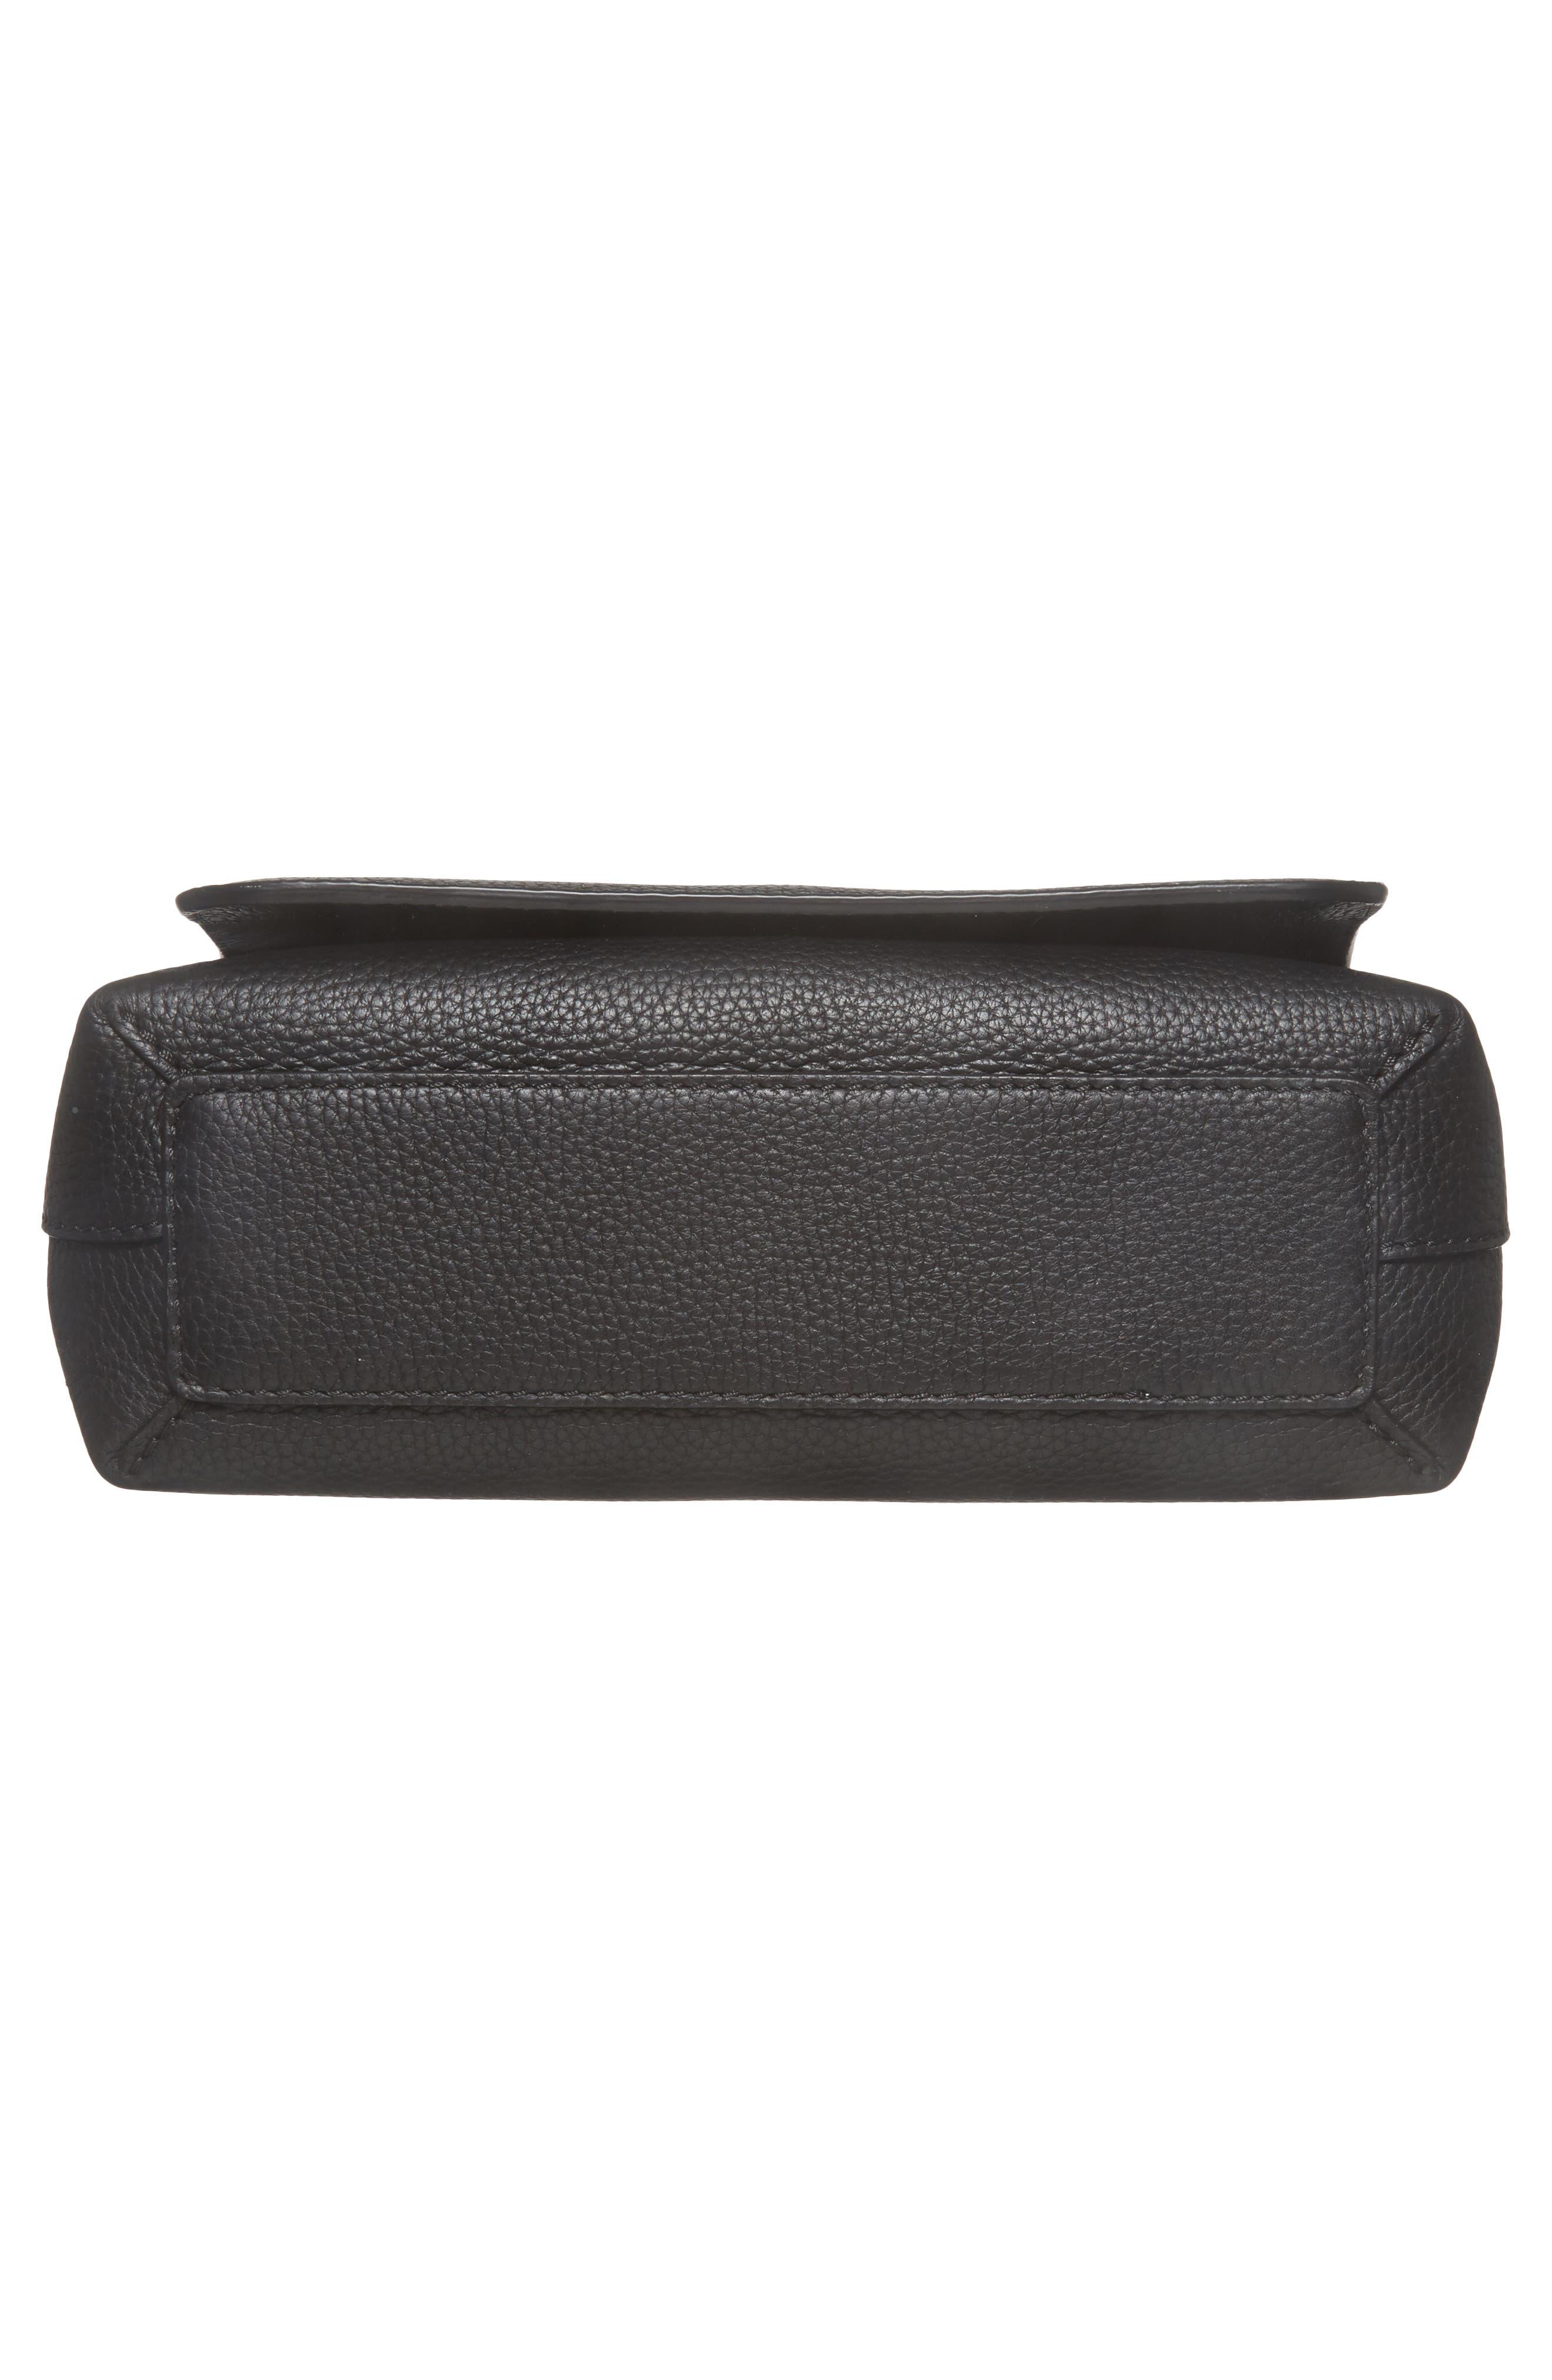 Small Burleigh Leather Crossbody Bag,                             Alternate thumbnail 6, color,                             001